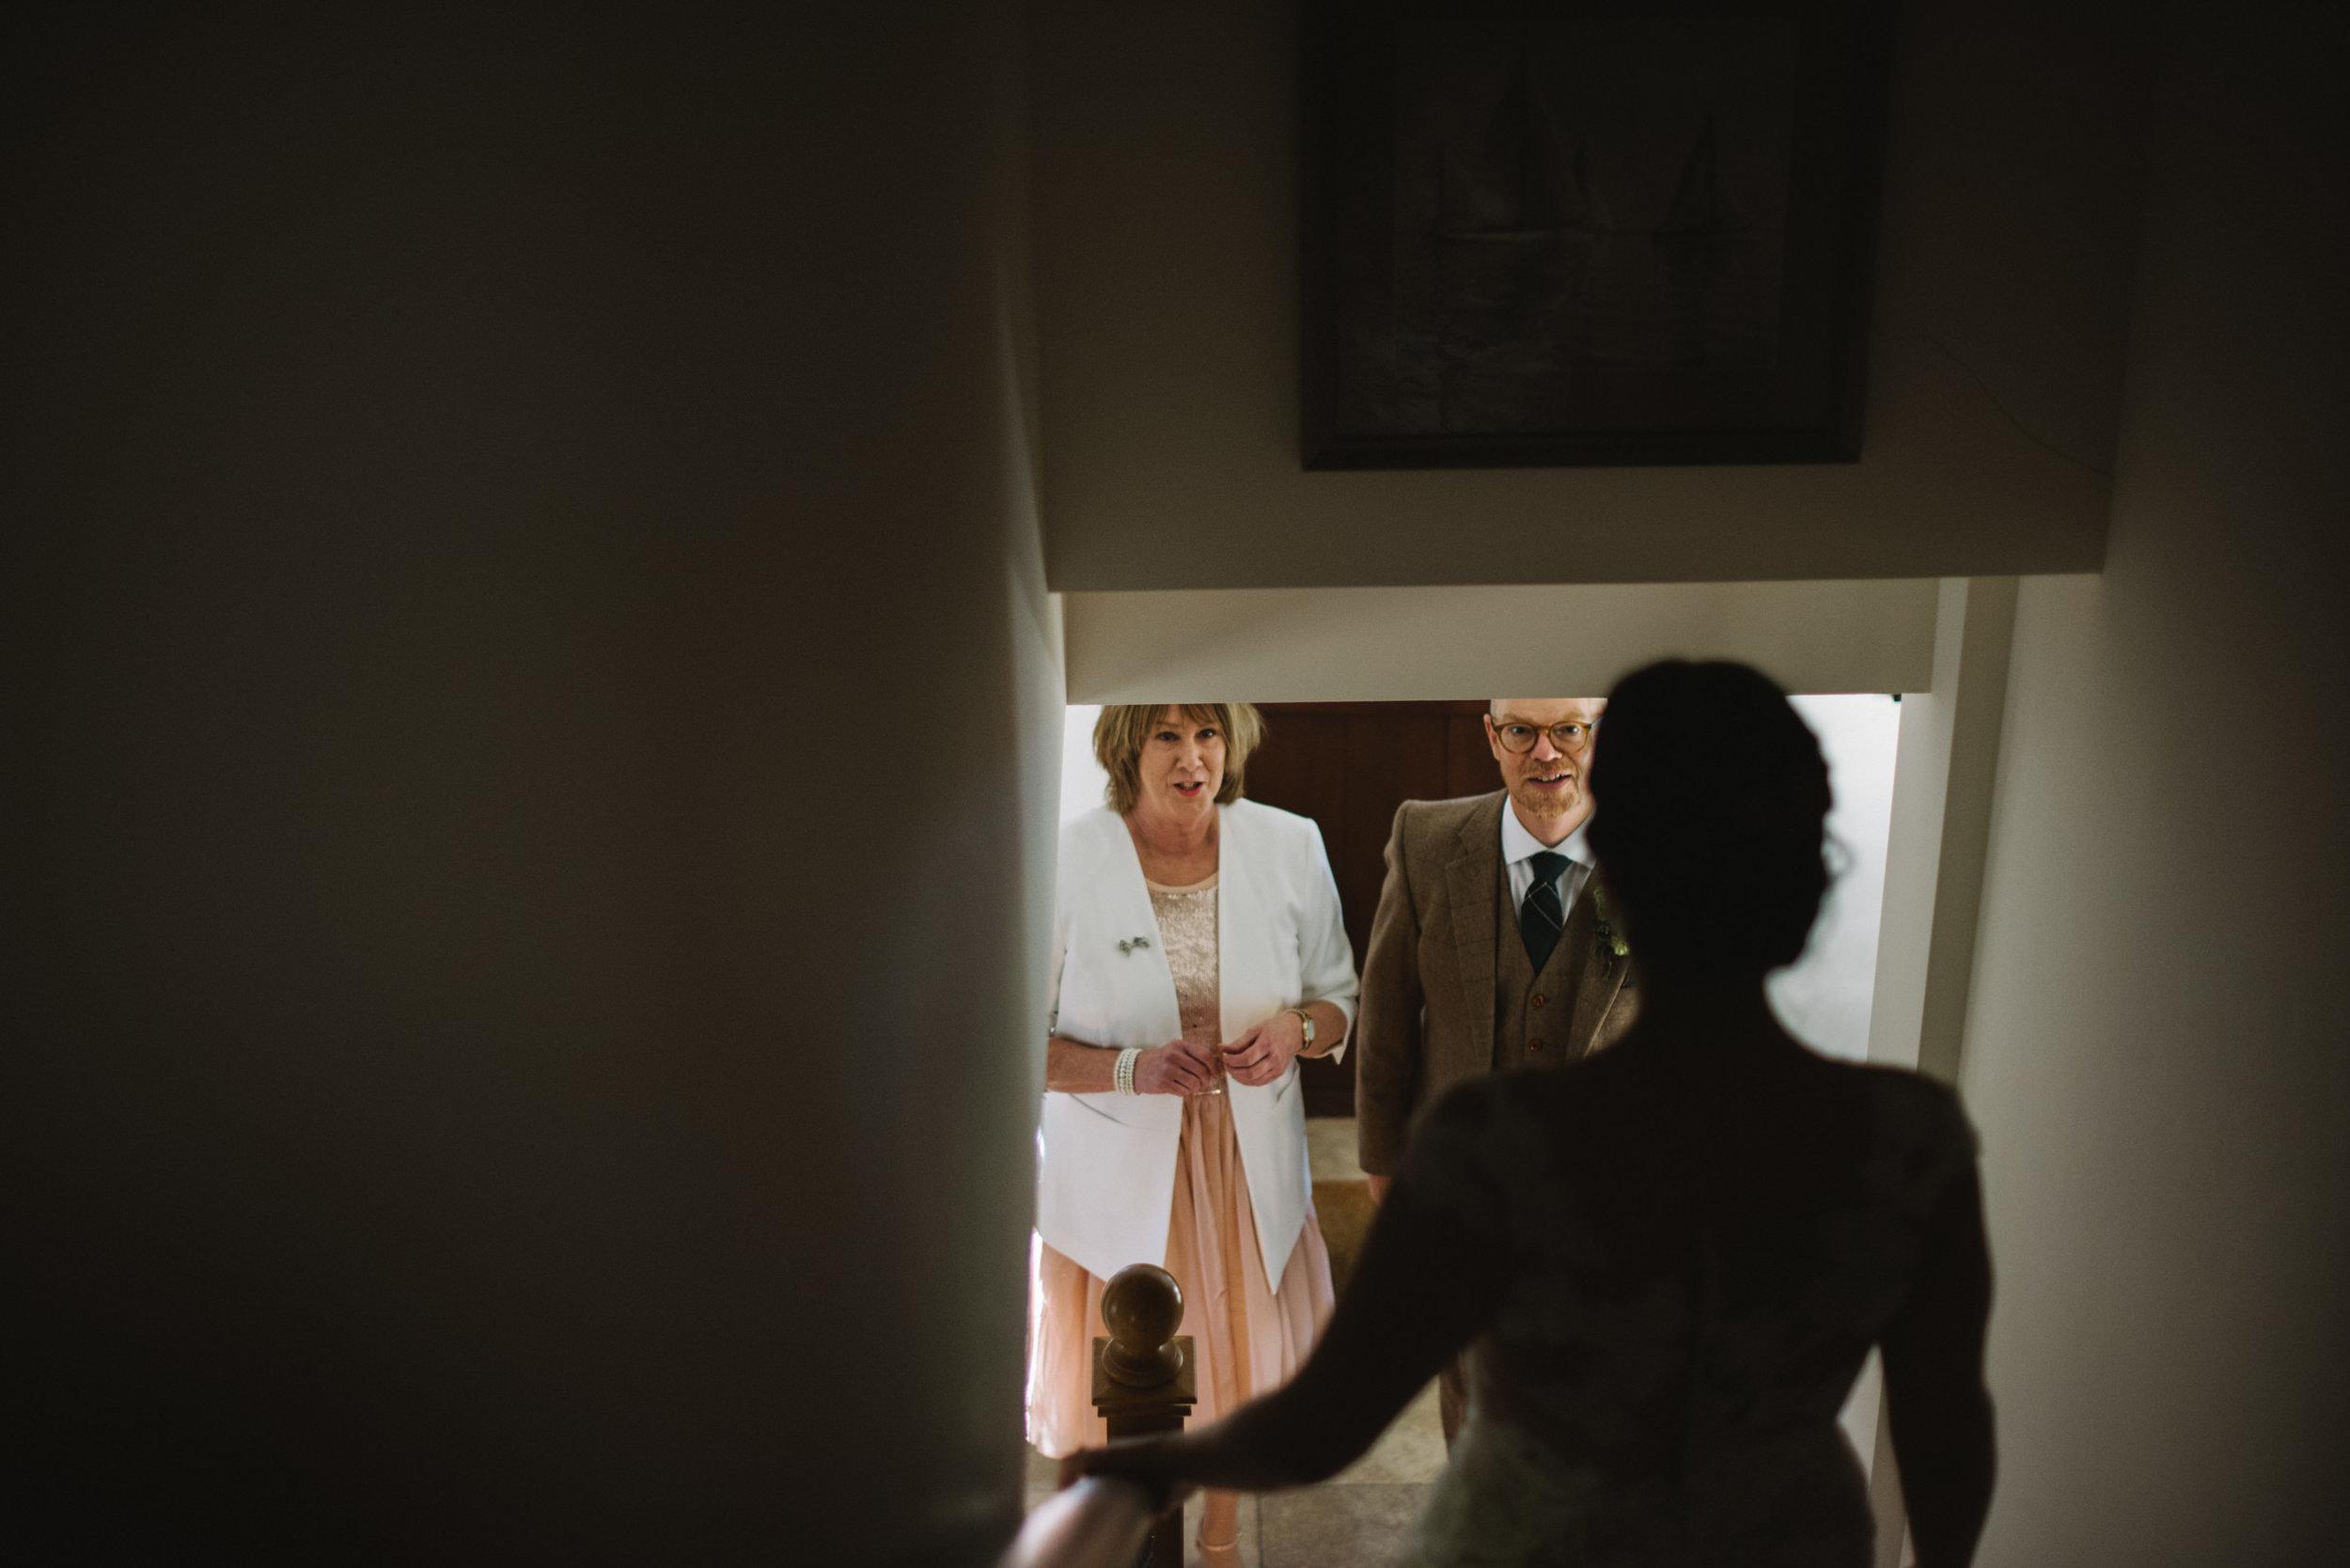 0007-LISA-DEVINE-PHOTOGRAPHY-ALTERNATIVE-WEDDING-PHOTOGRAPHY-SCOTLAND-DESTINATION-WEDDINGS-GLASGOW-WEDDINGS-COOL-WEDDINGS-STYLISH-WEDDINGS.JPG